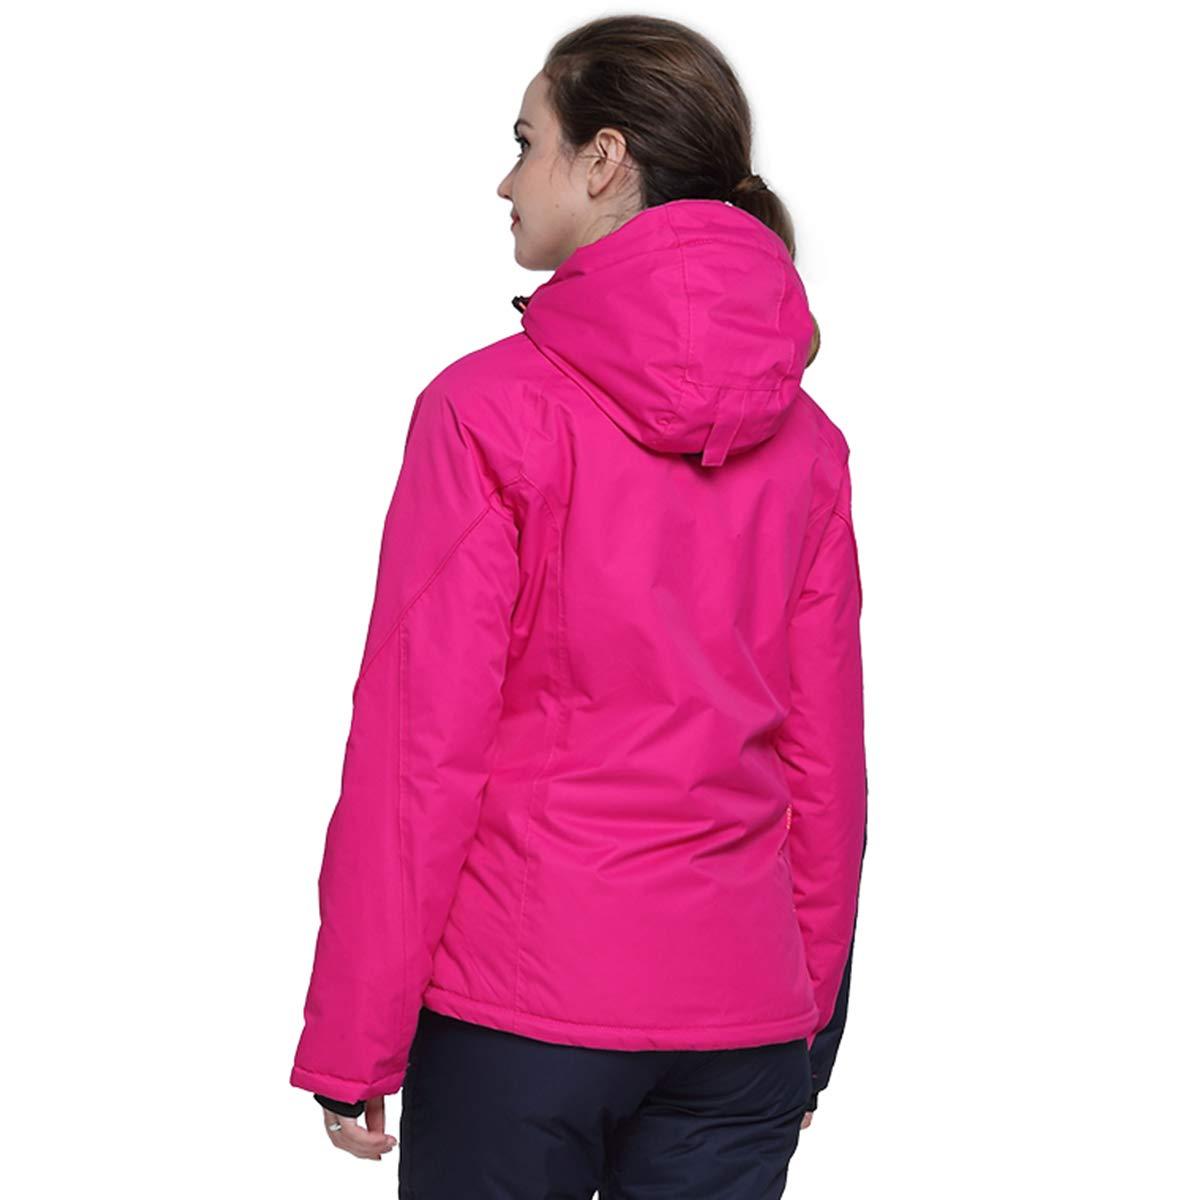 Victrax Womens Waterproof Ski Jacket Warm Windproof Hooded Snowboard Jacket